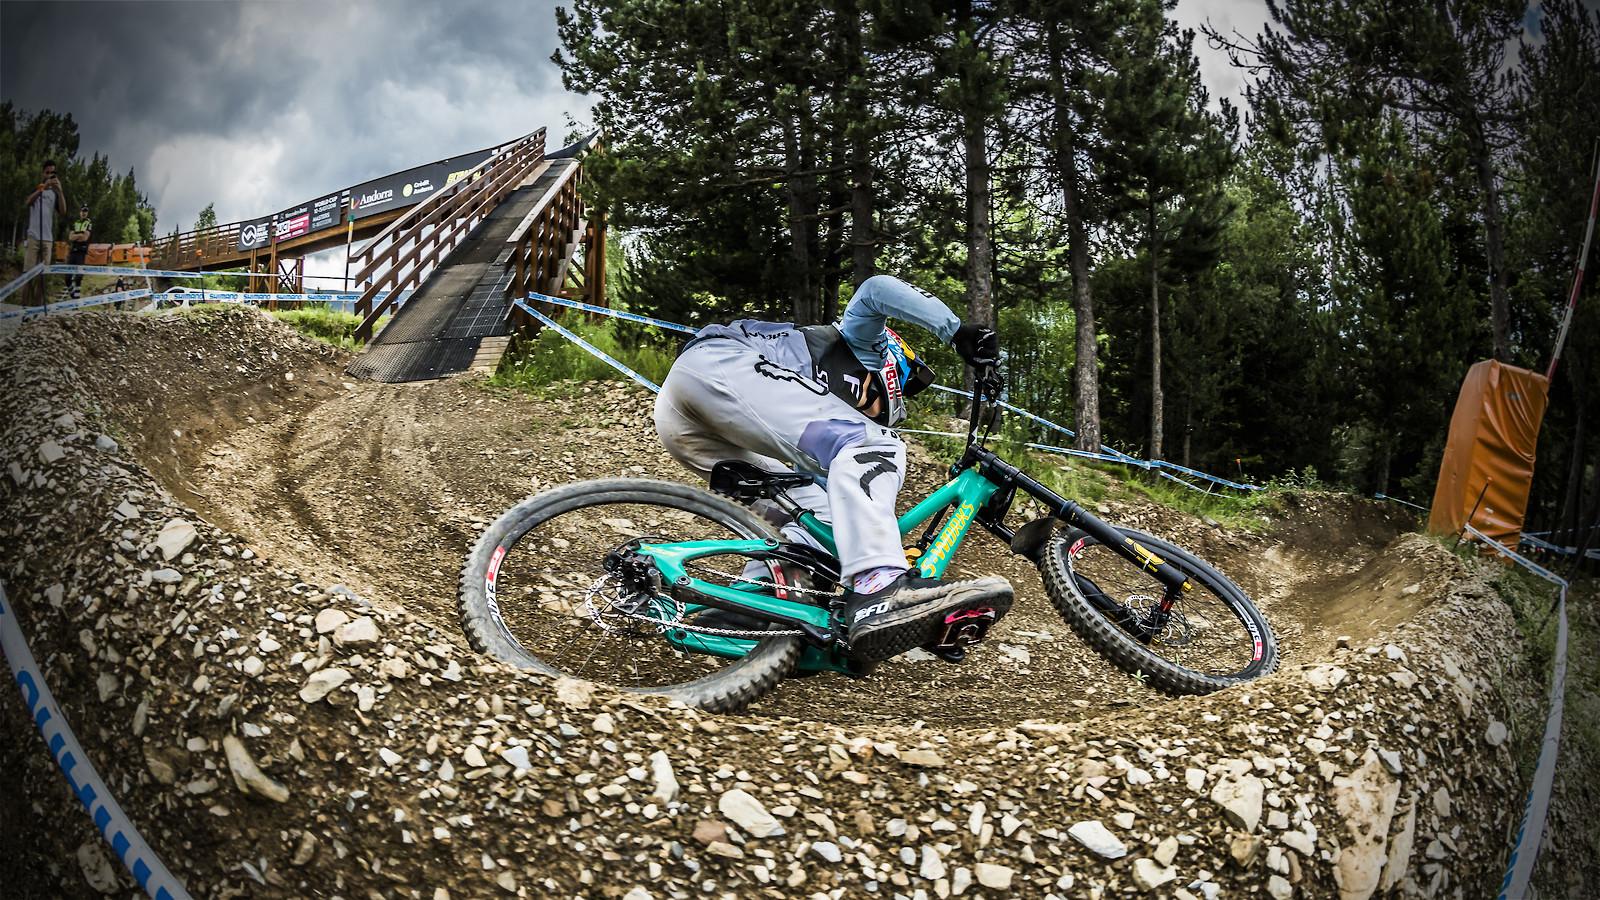 43844613800 f9d7634c5e o - phunkt.com - Mountain Biking Pictures - Vital MTB